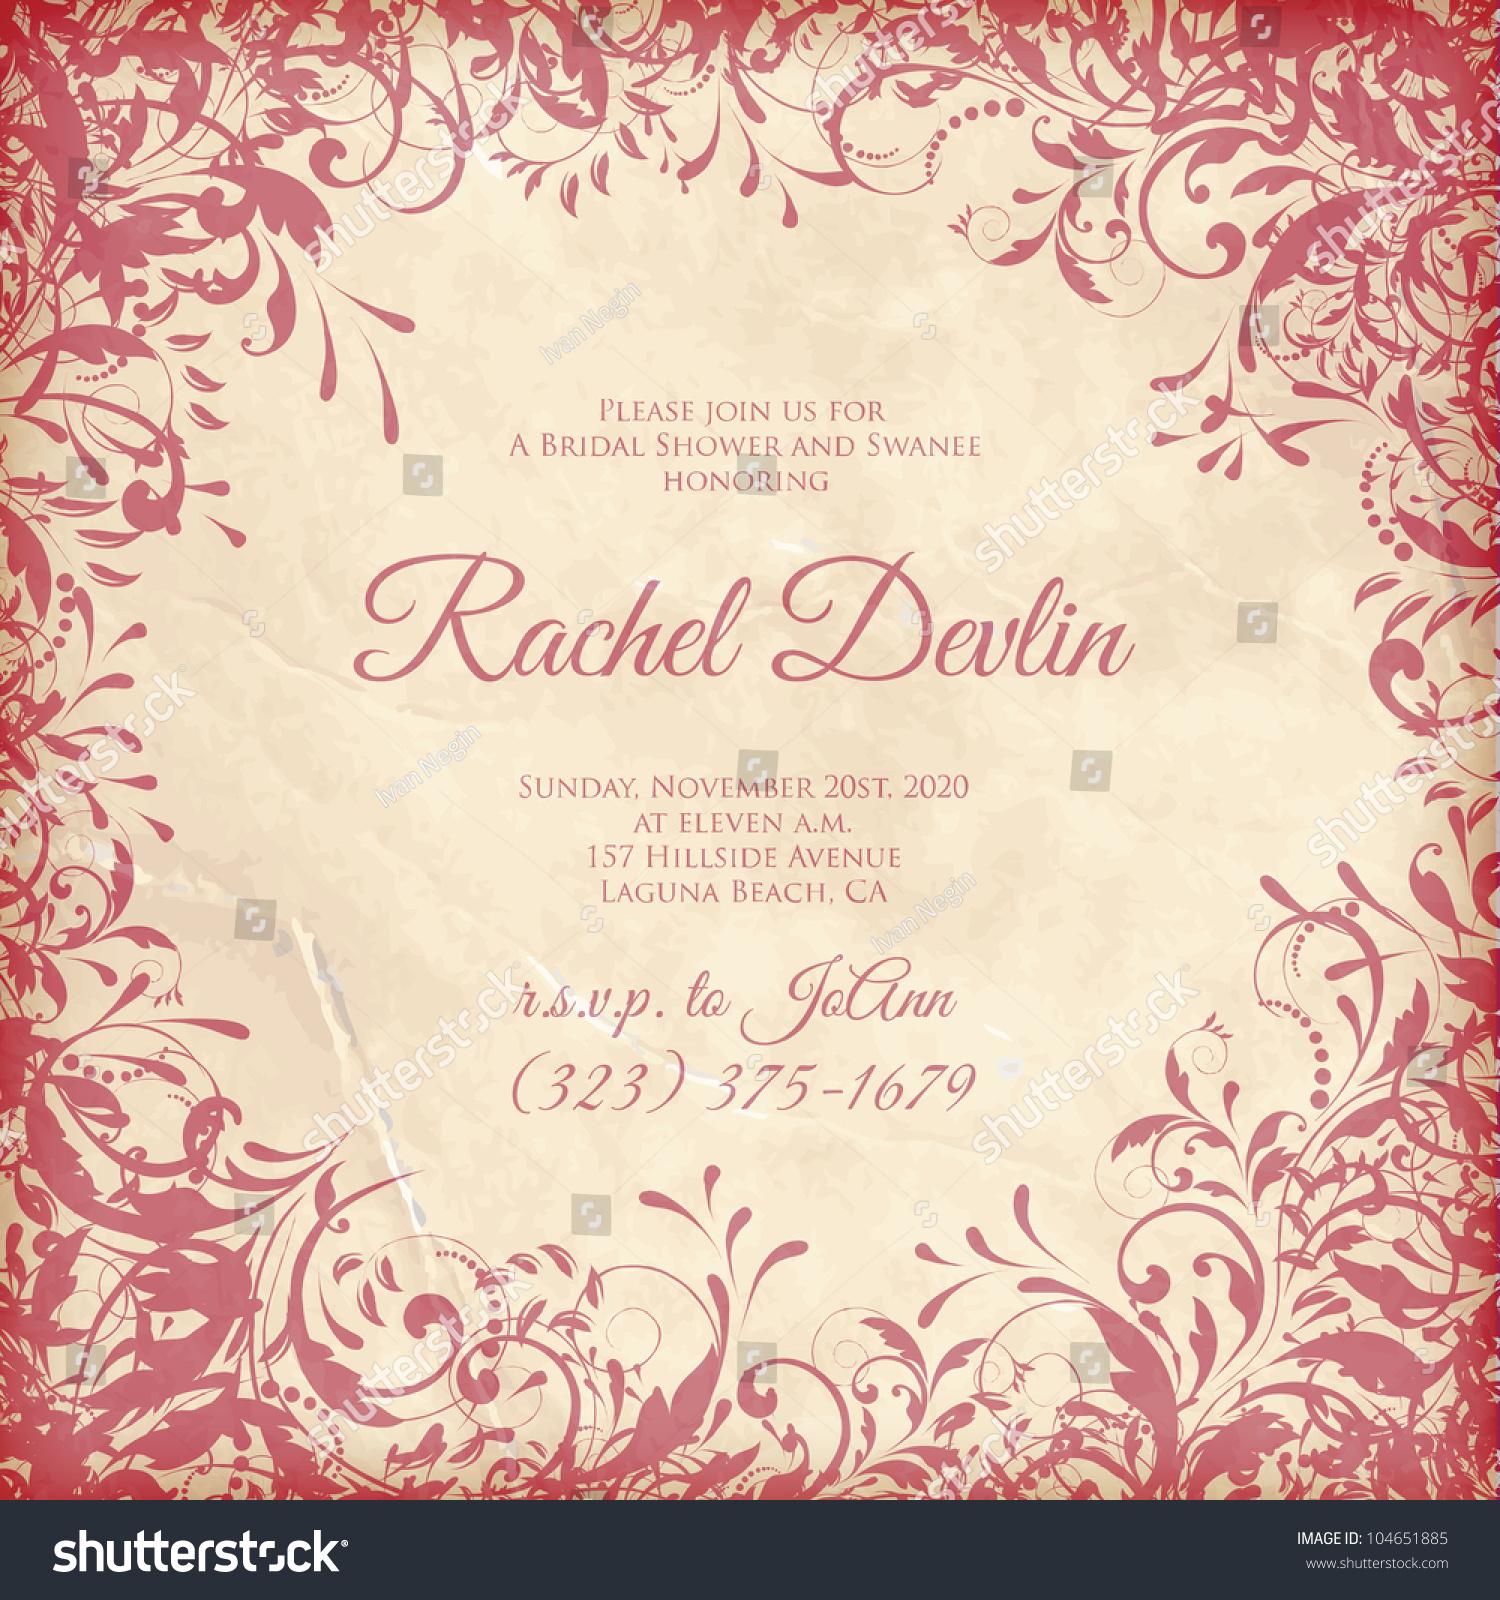 invit 1 wedding card invitation wedding invitations51